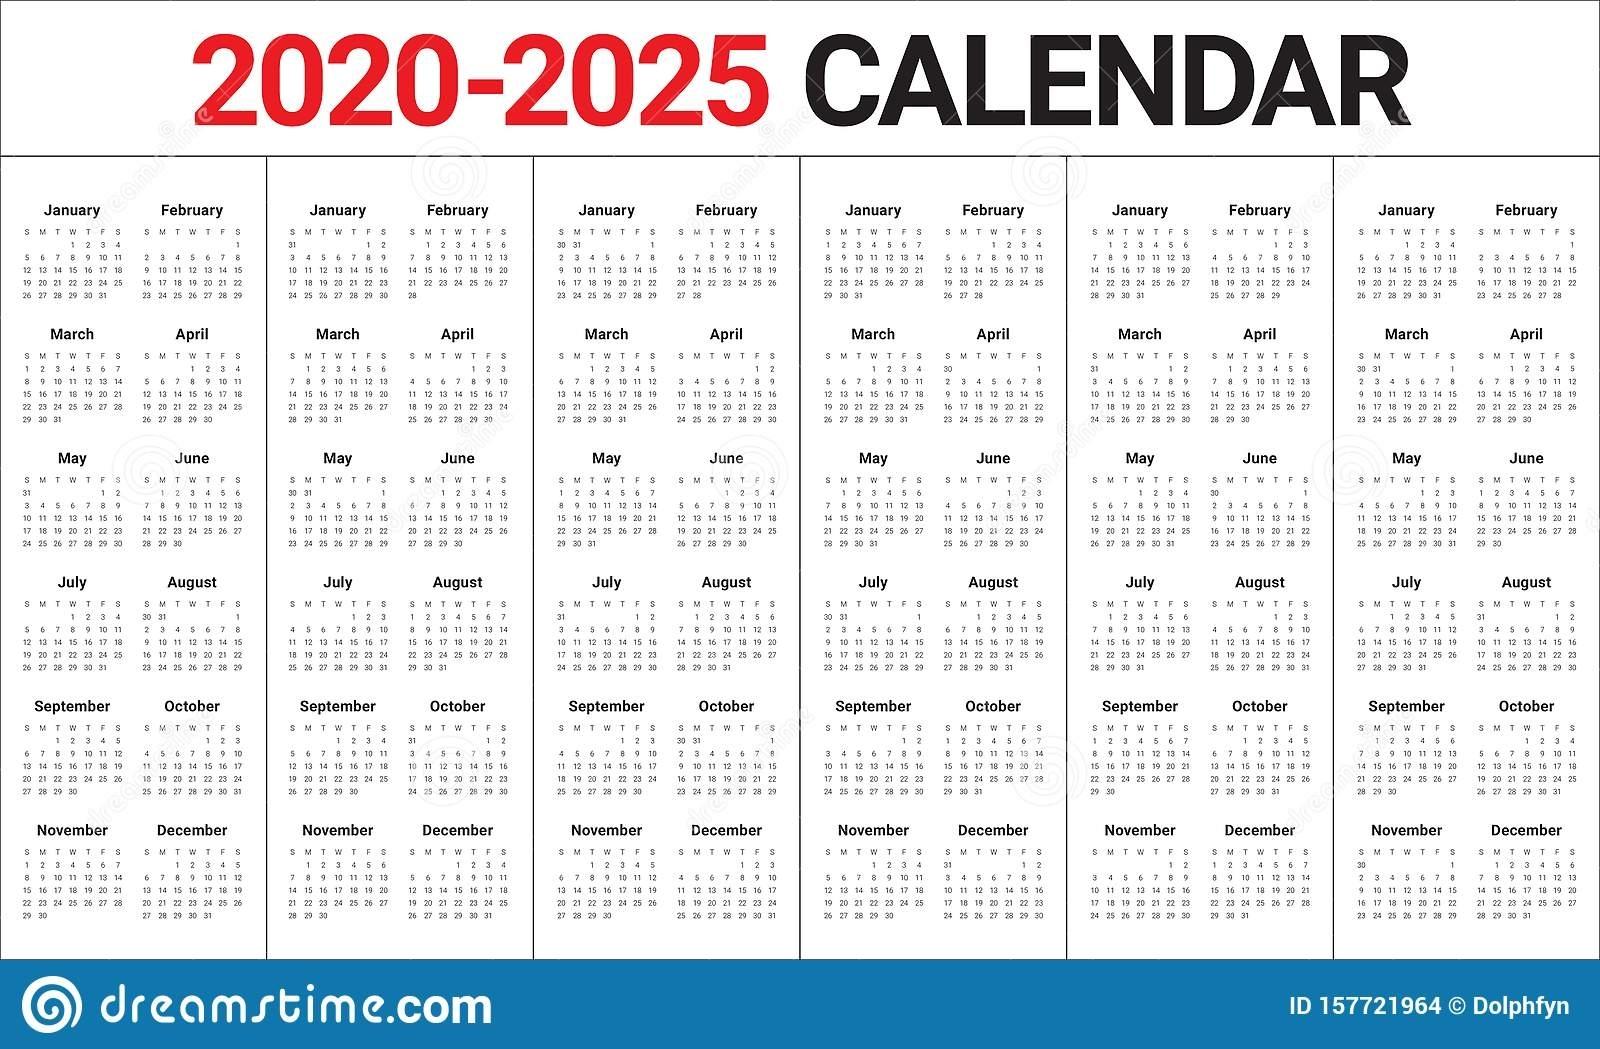 Year 2020 2021 2022 2023 2024 2025 Calendar Vector Design 5 Year Calendar Template